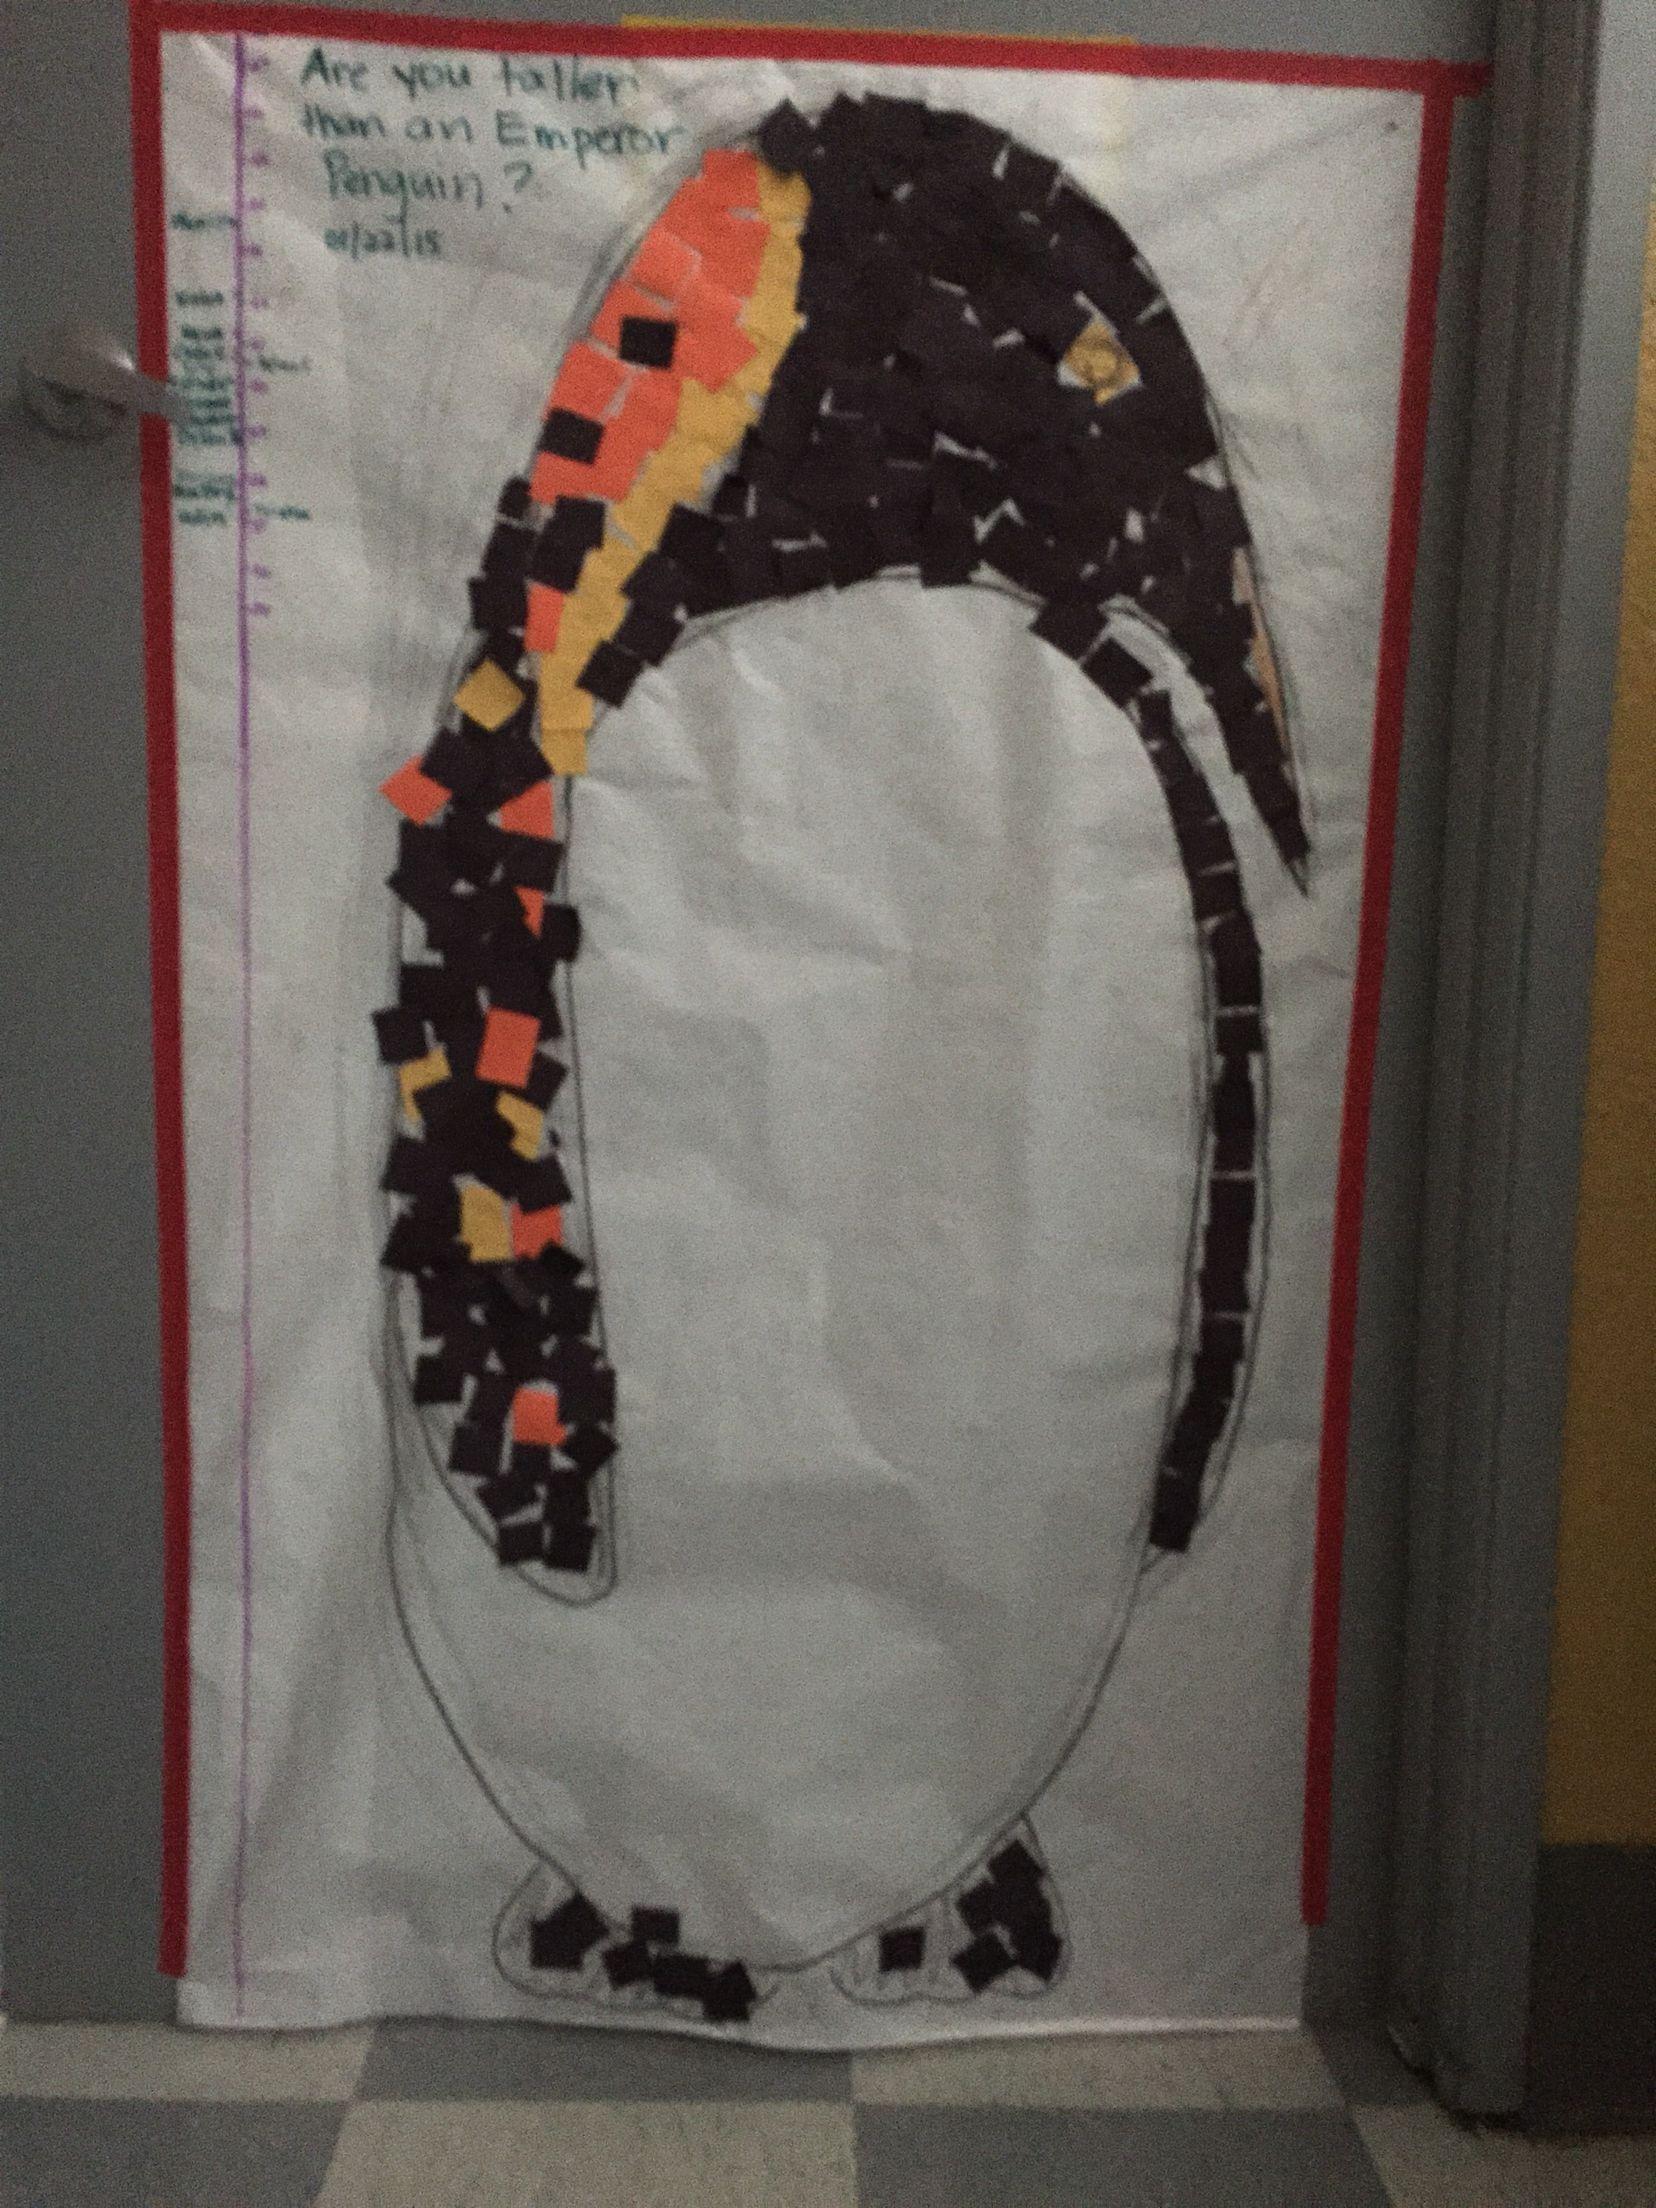 Emperor penguin height chart also school arts and crafts pinterest rh